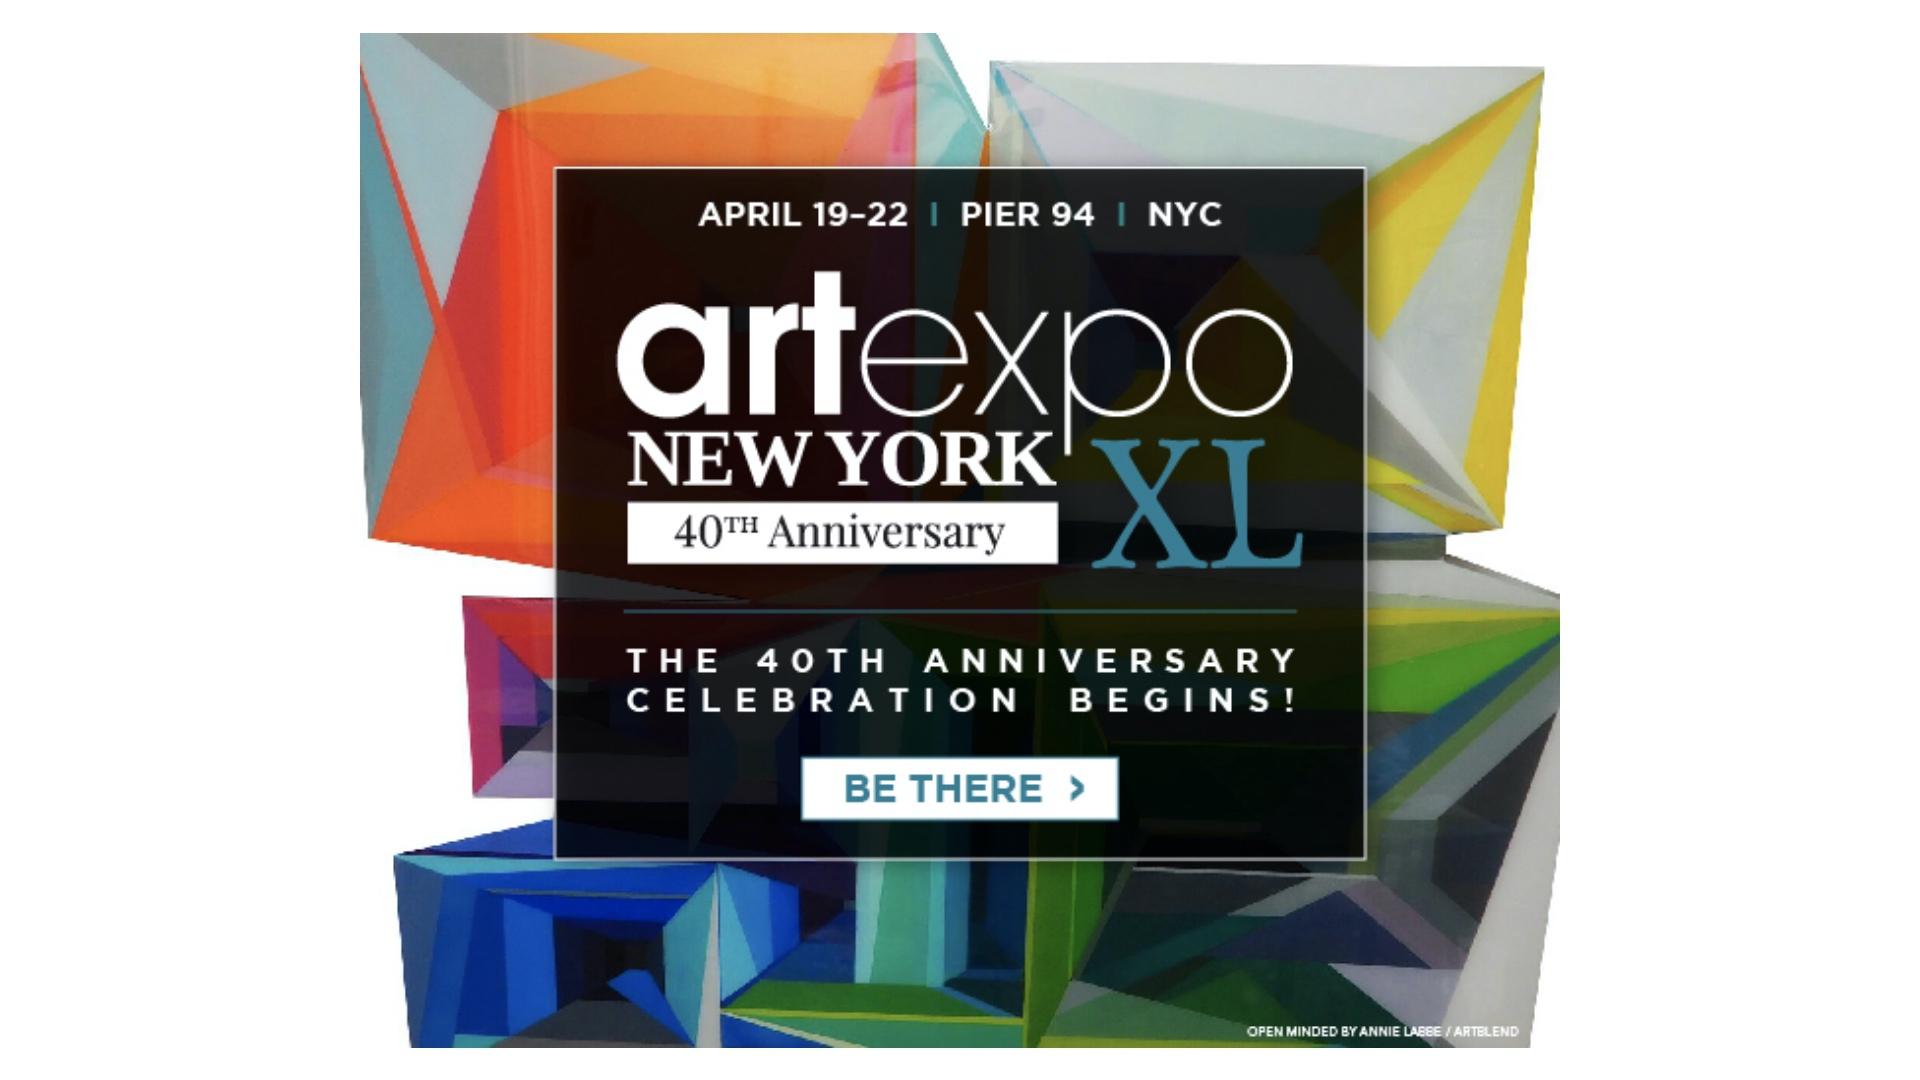 Artexpo New York Newsletter. Join us as Artexpo kicks off next week